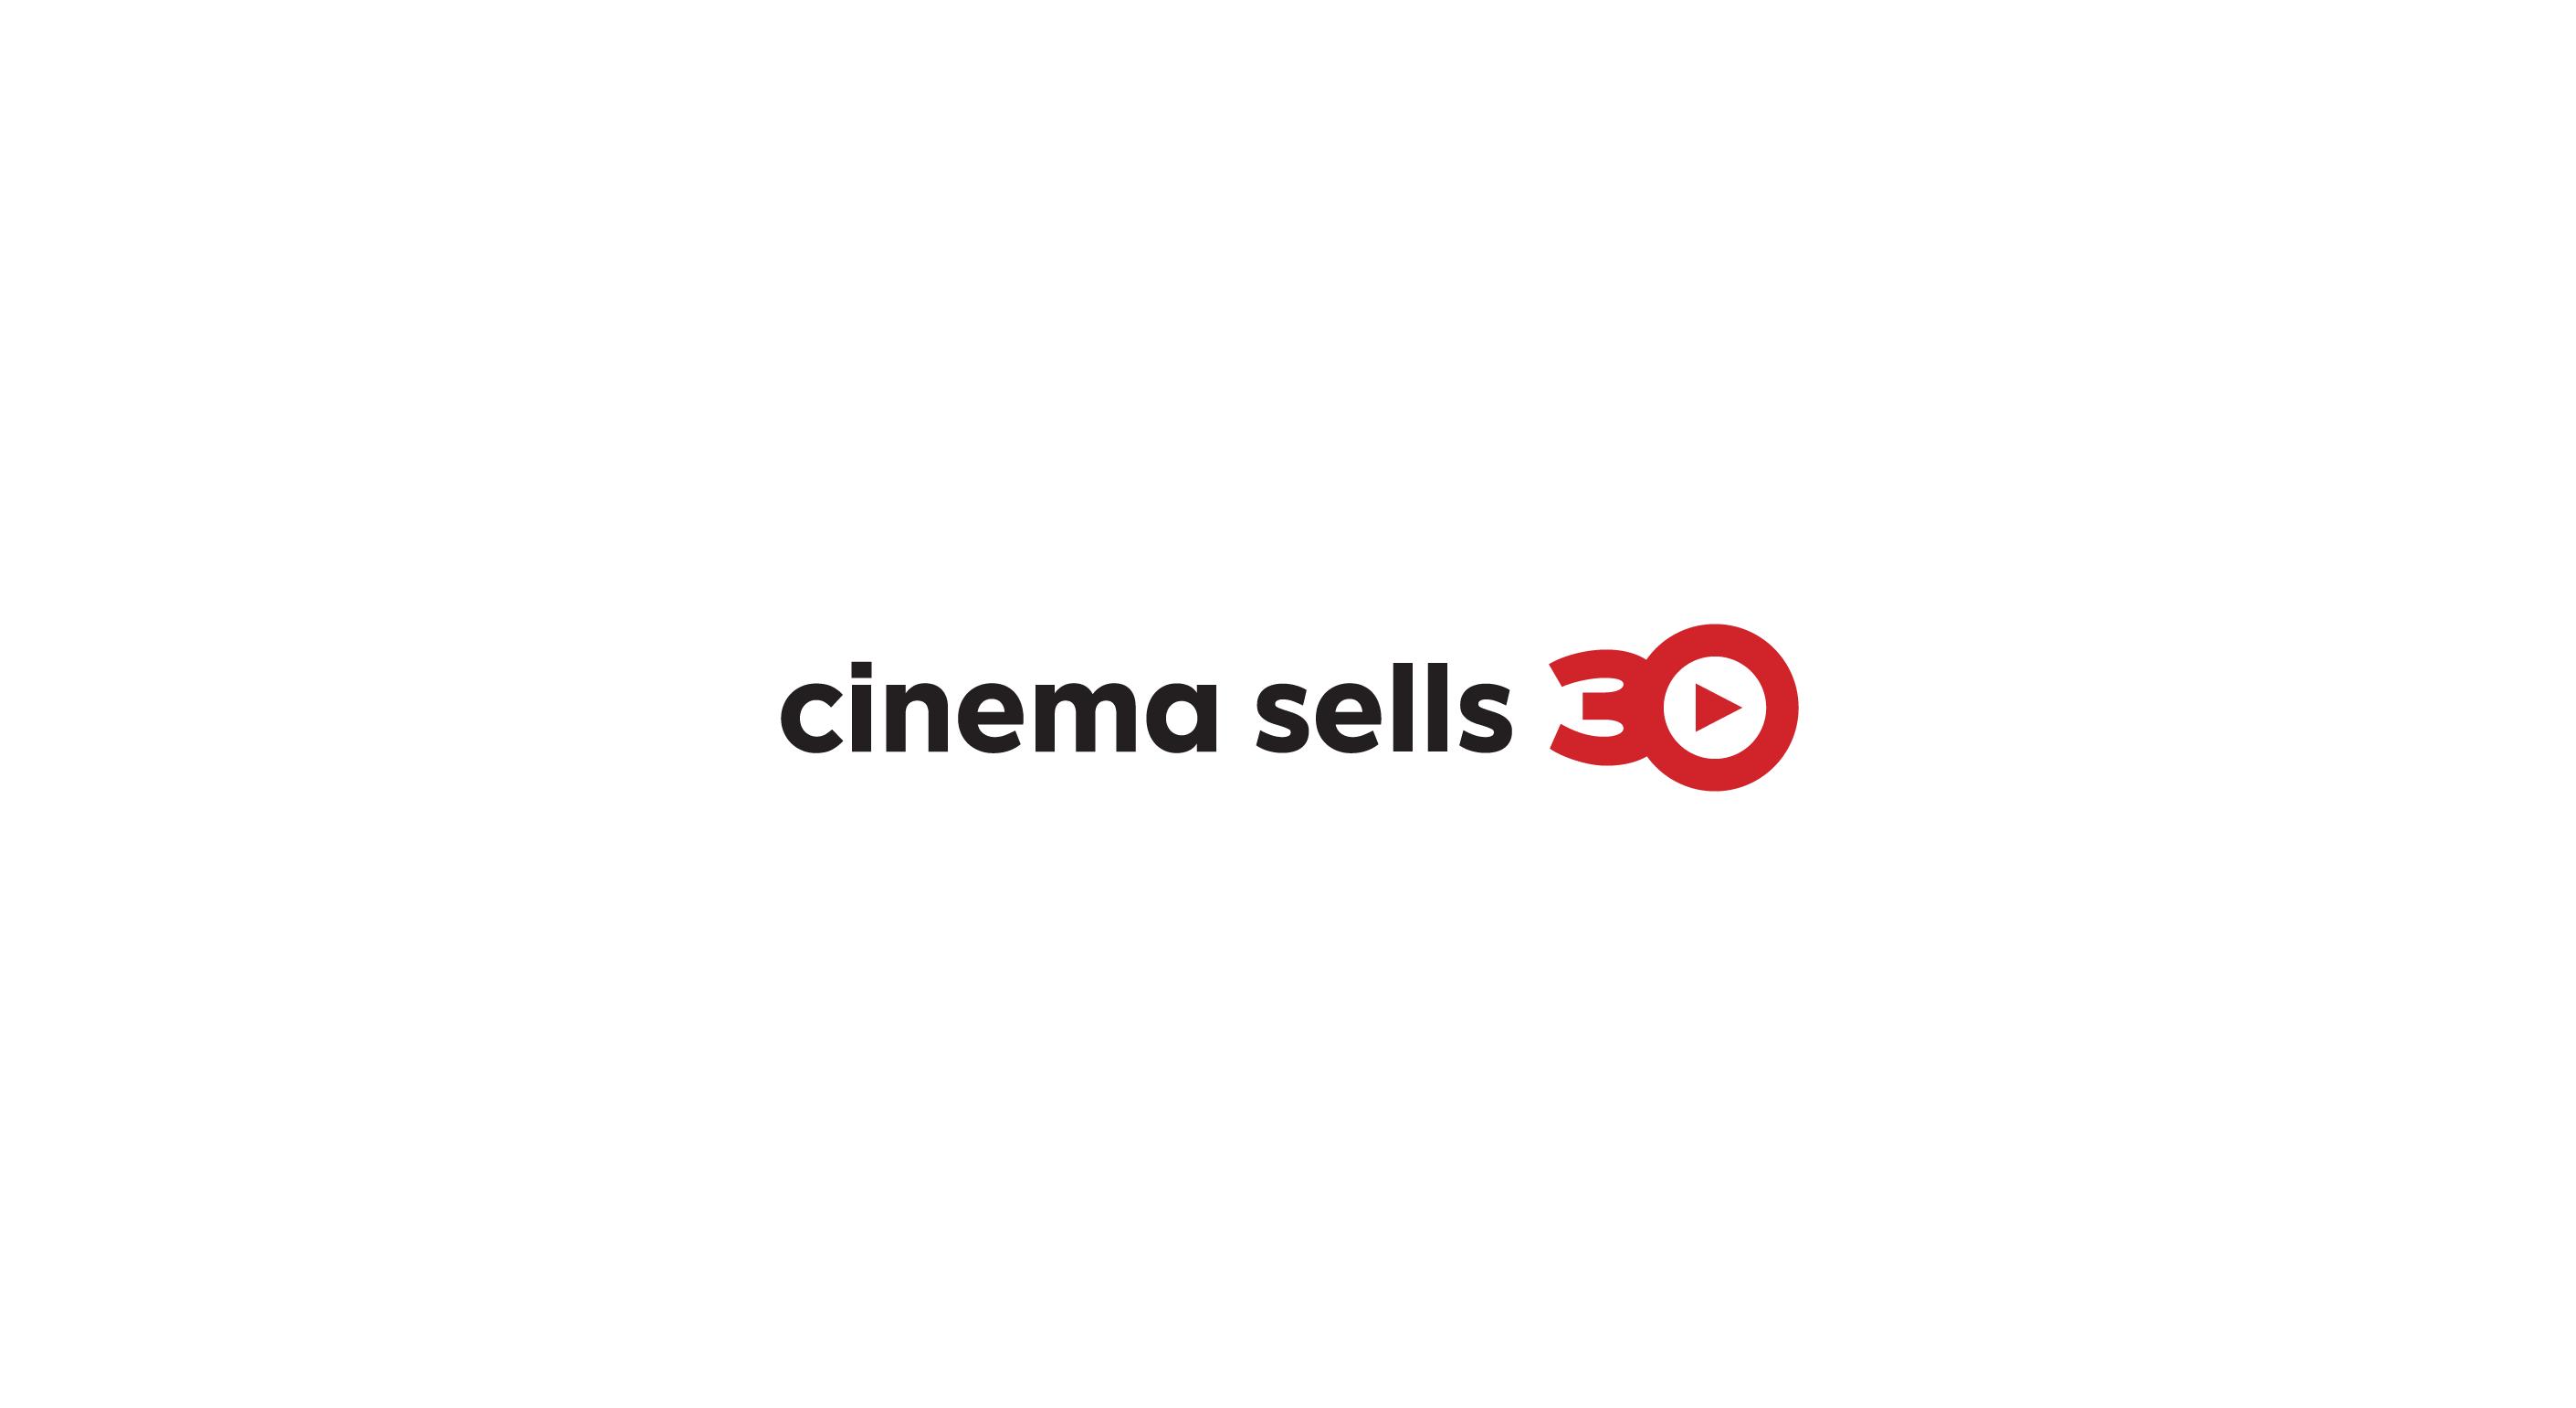 CinemaSells30